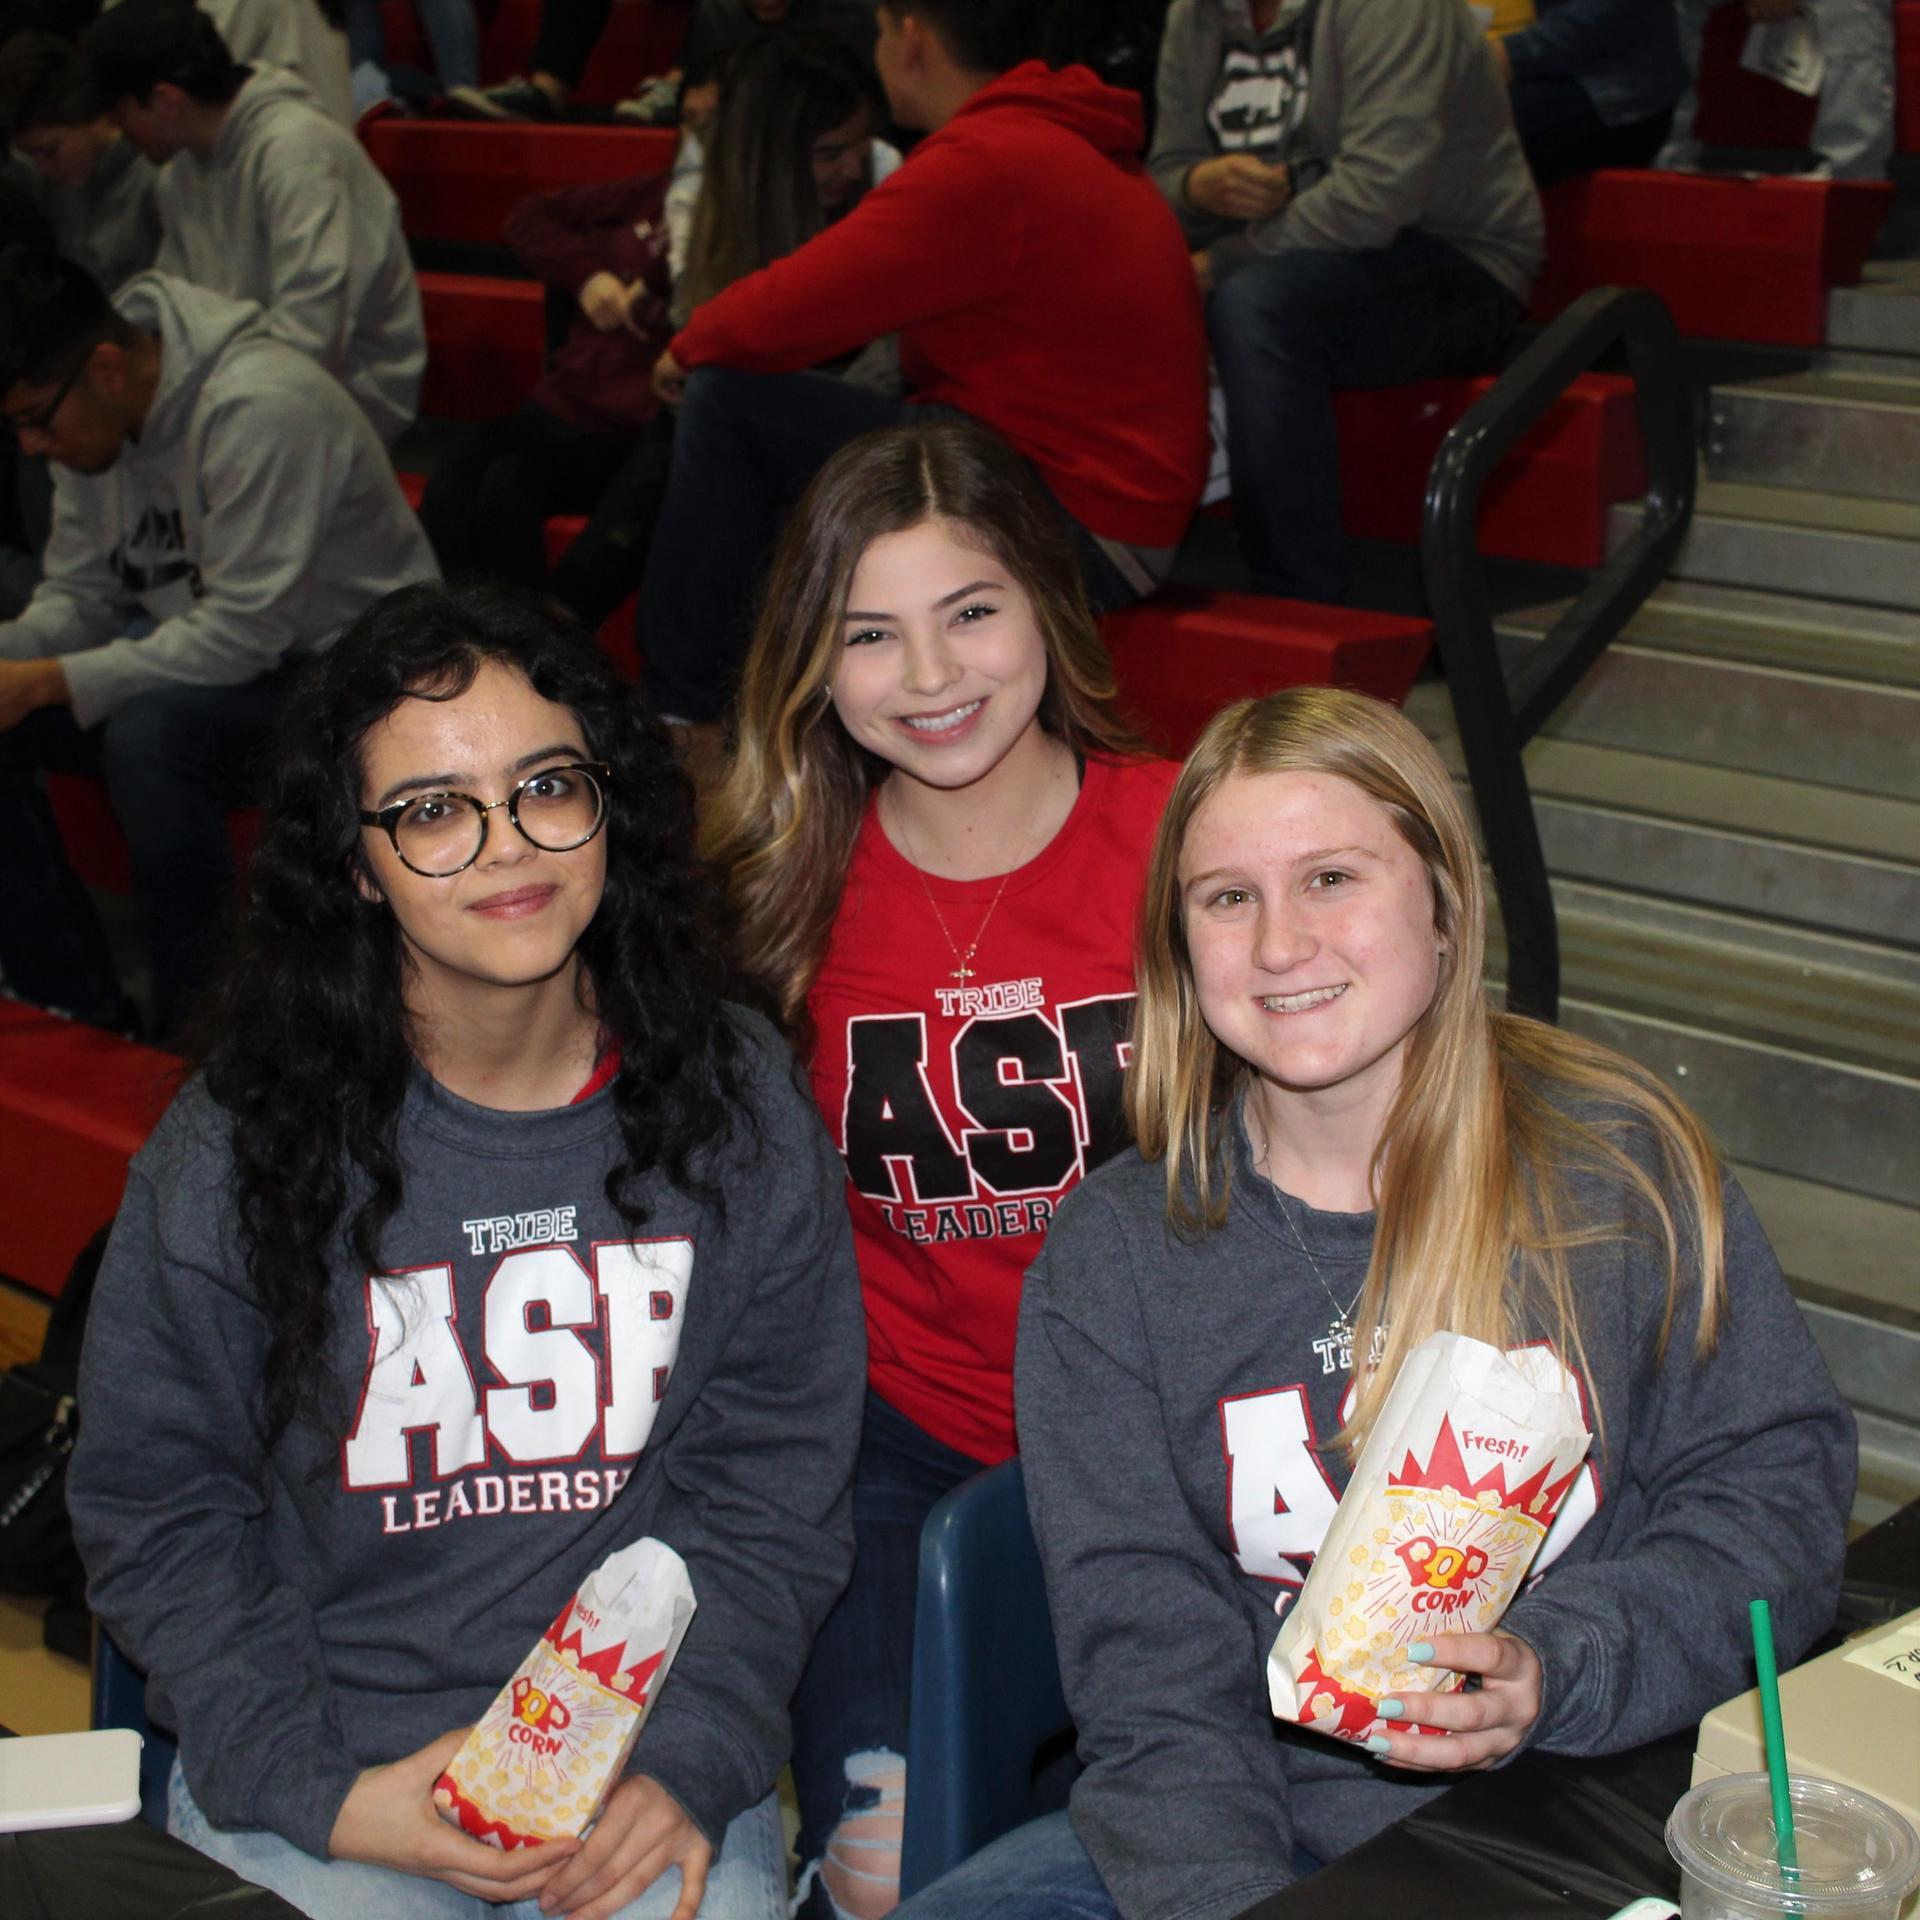 Samantha Donato, Judith Jimenez, and Kirsten Grissom